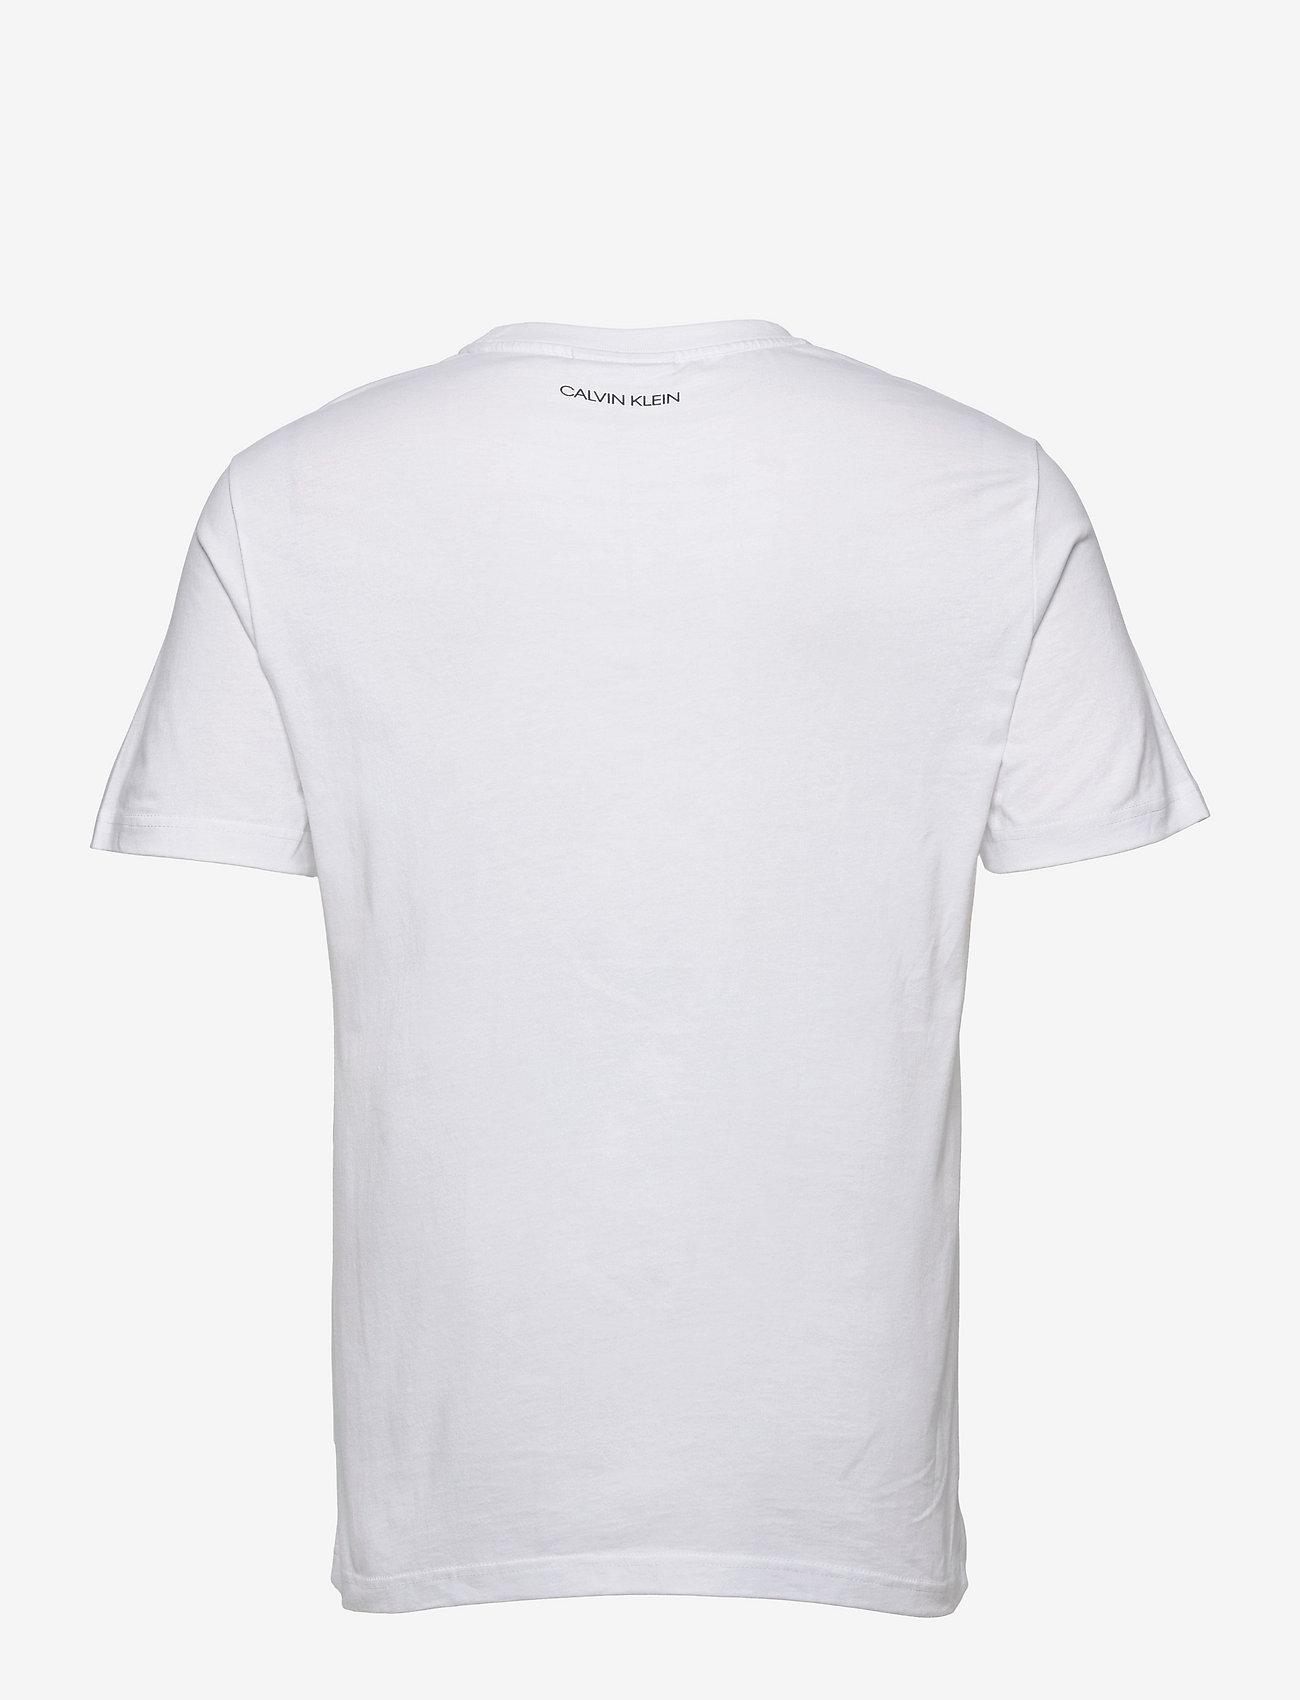 Calvin Klein - LOGO LINES BADGE T-SHIRT - t-shirts à manches courtes - bright white - 1